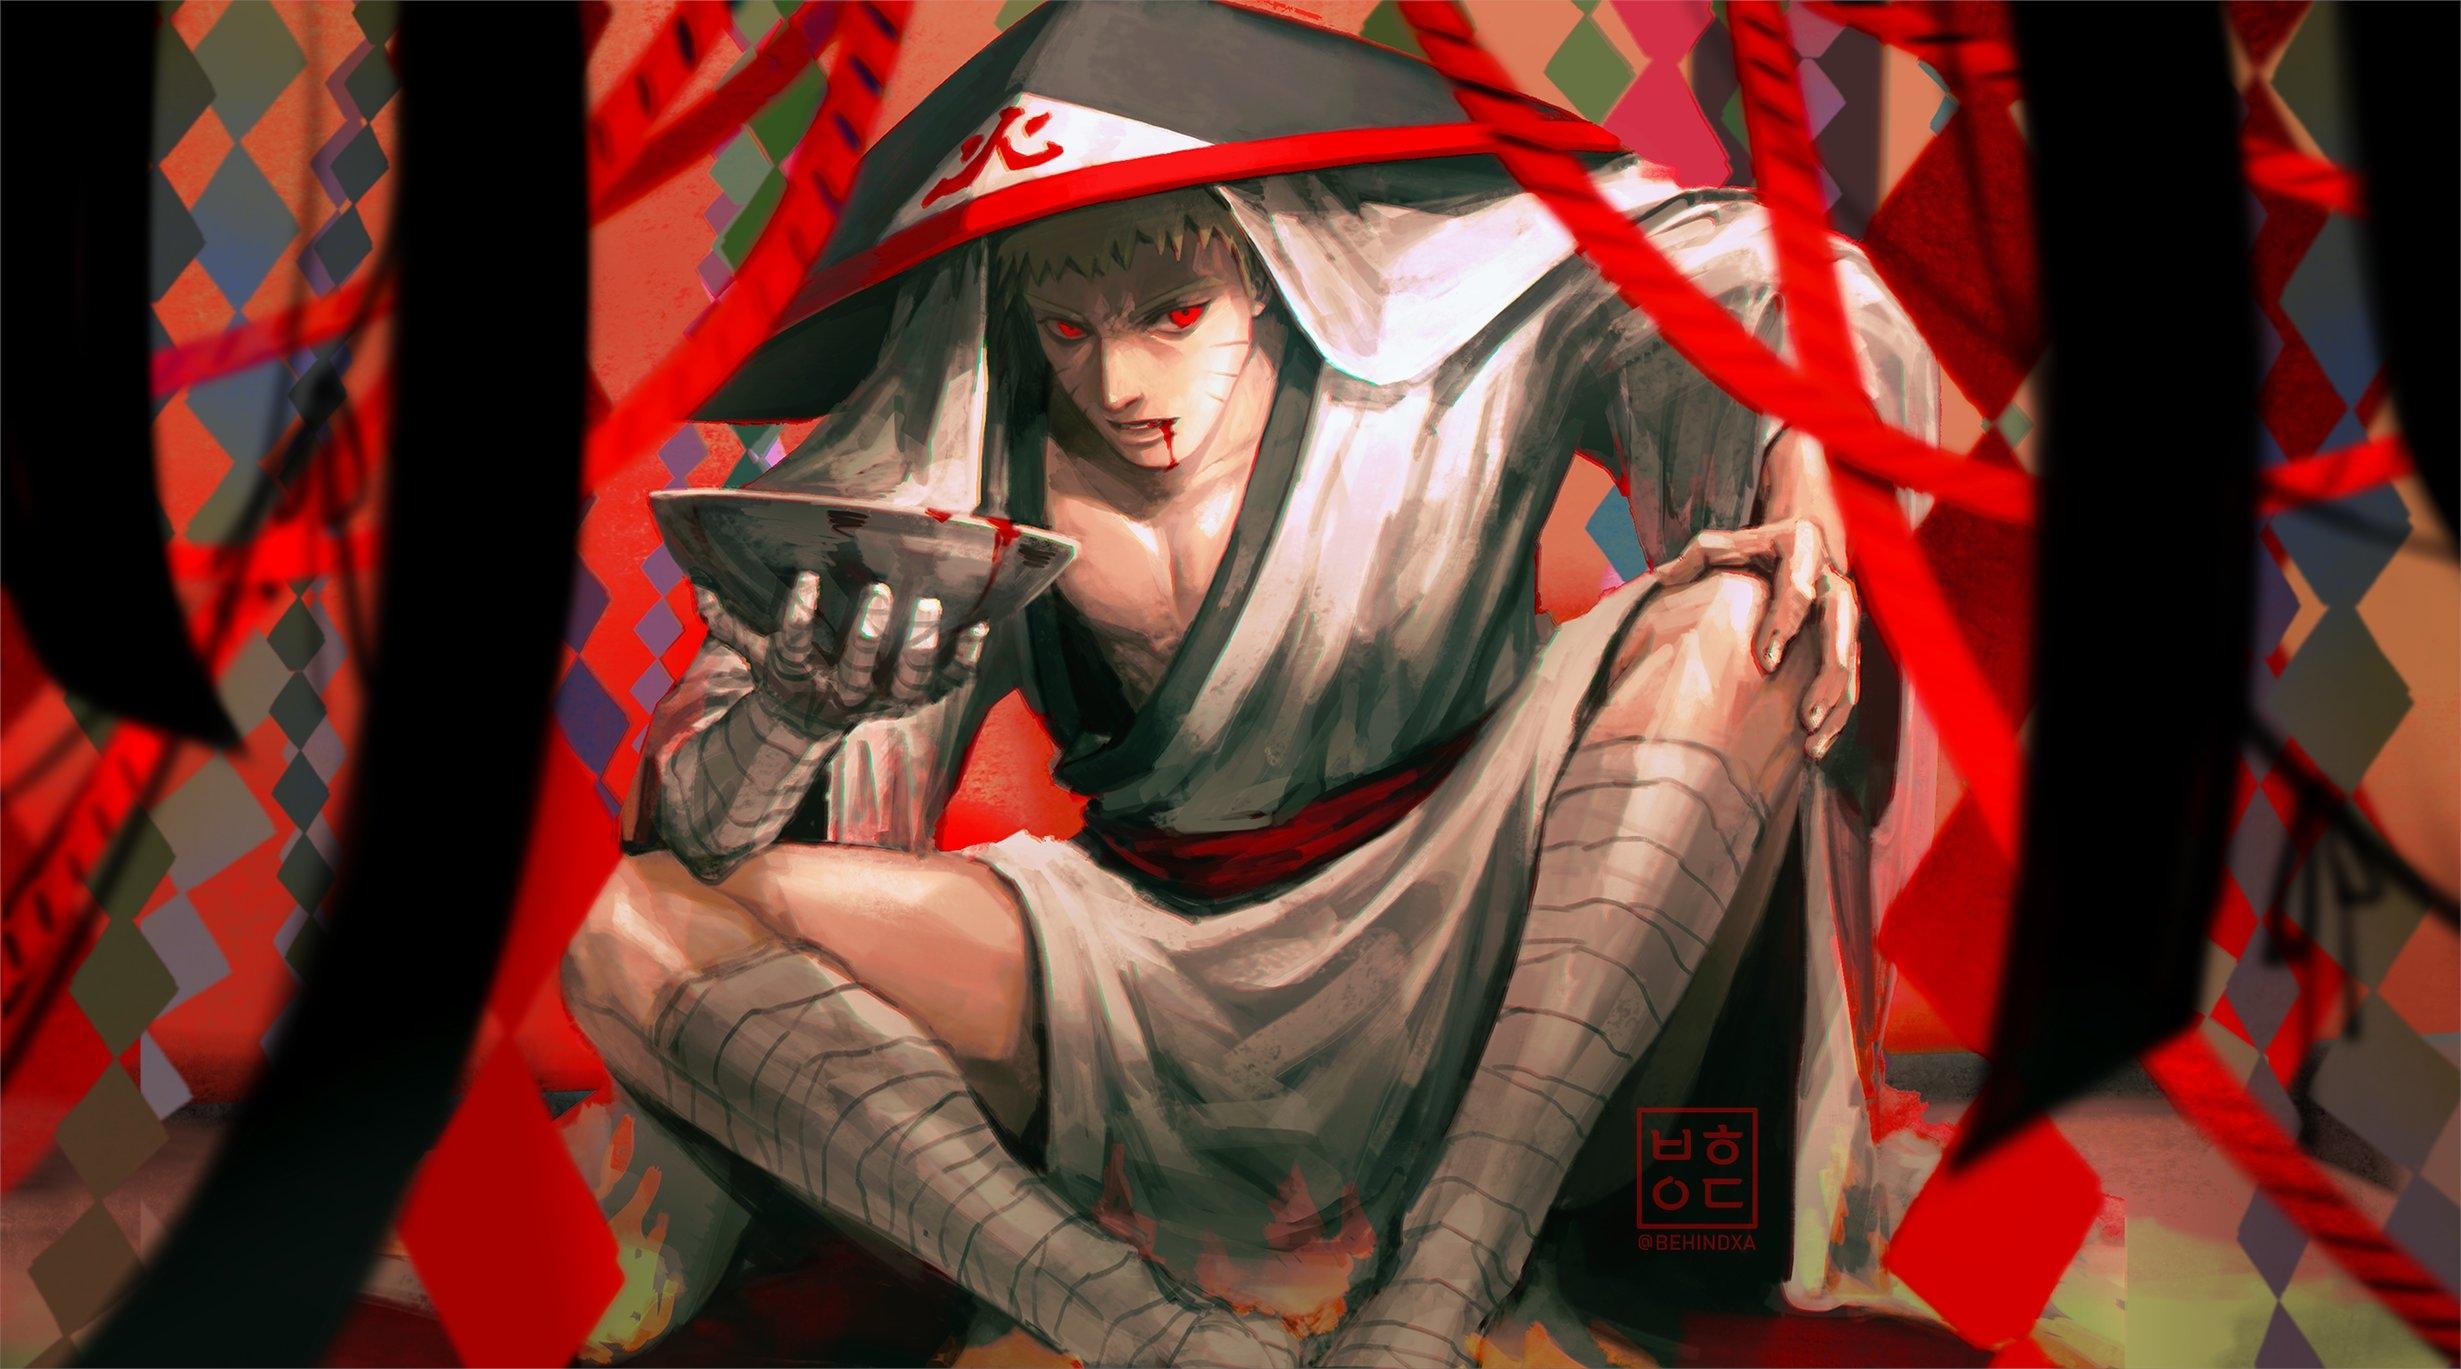 Boruto Digital Art Wallpaper, HD Anime 4K Wallpapers ...